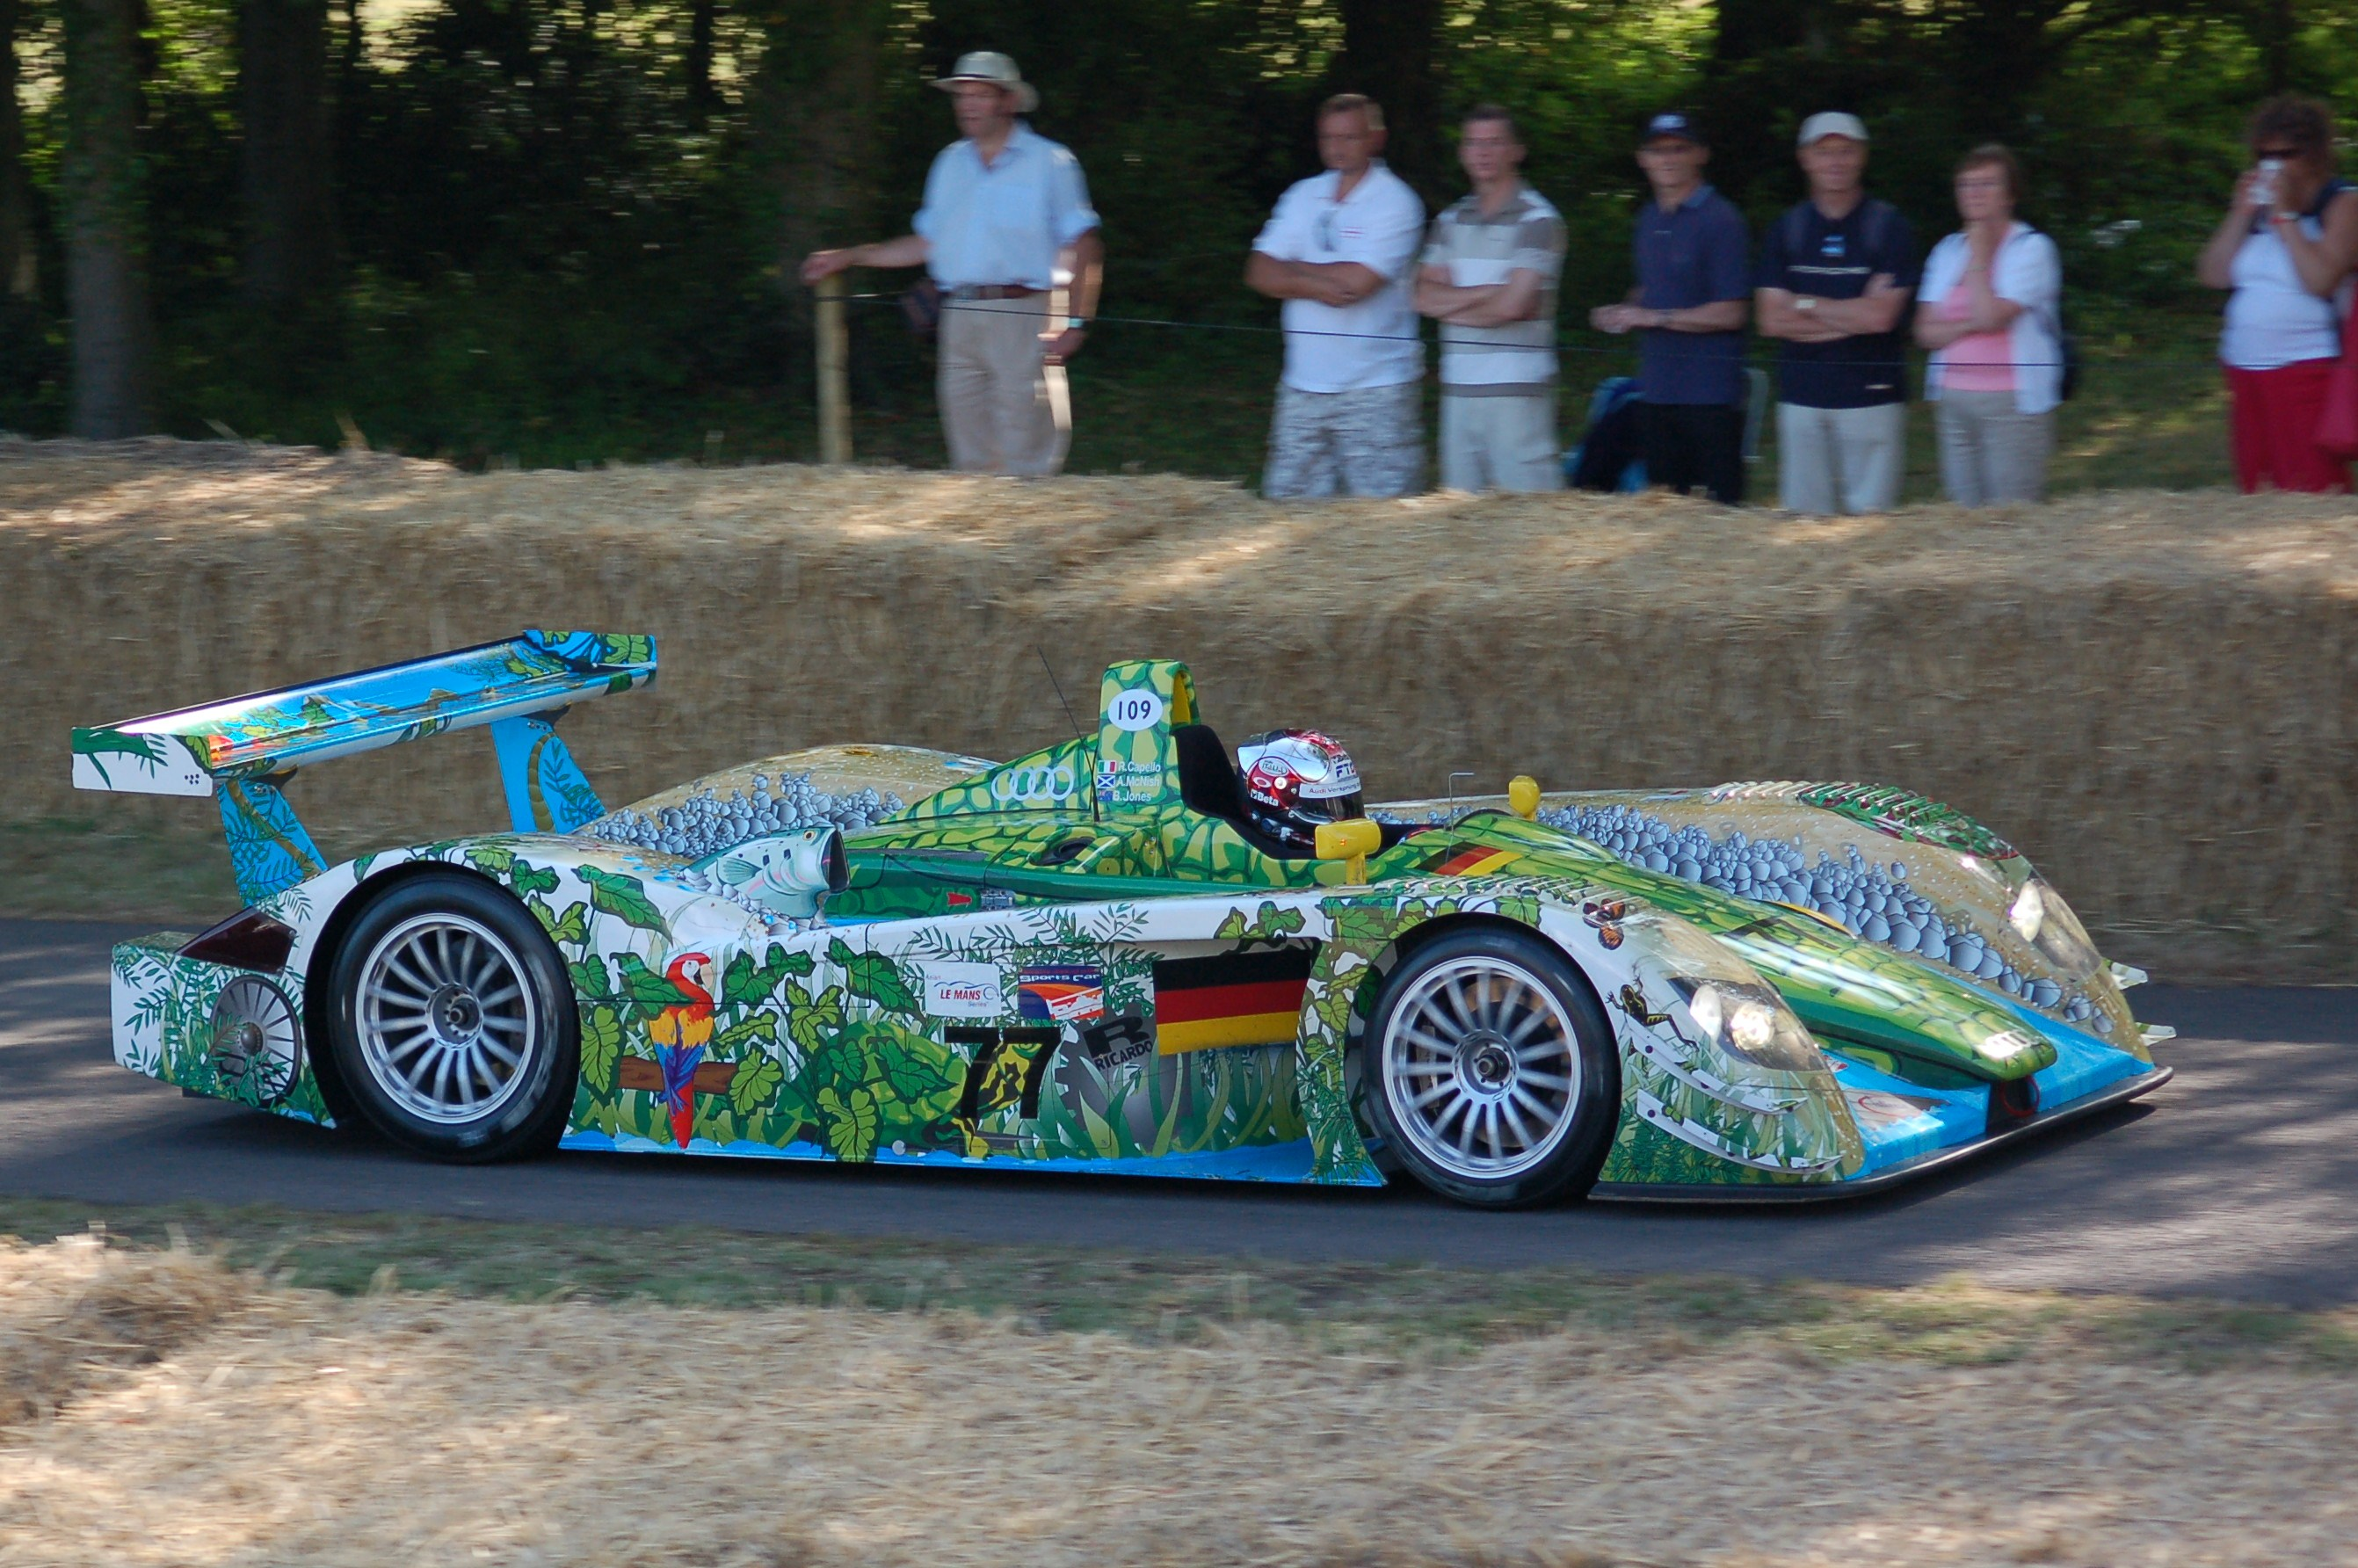 File:2000 Audi R8 Goodwood, 2009.JPG - Wikimedia Commons